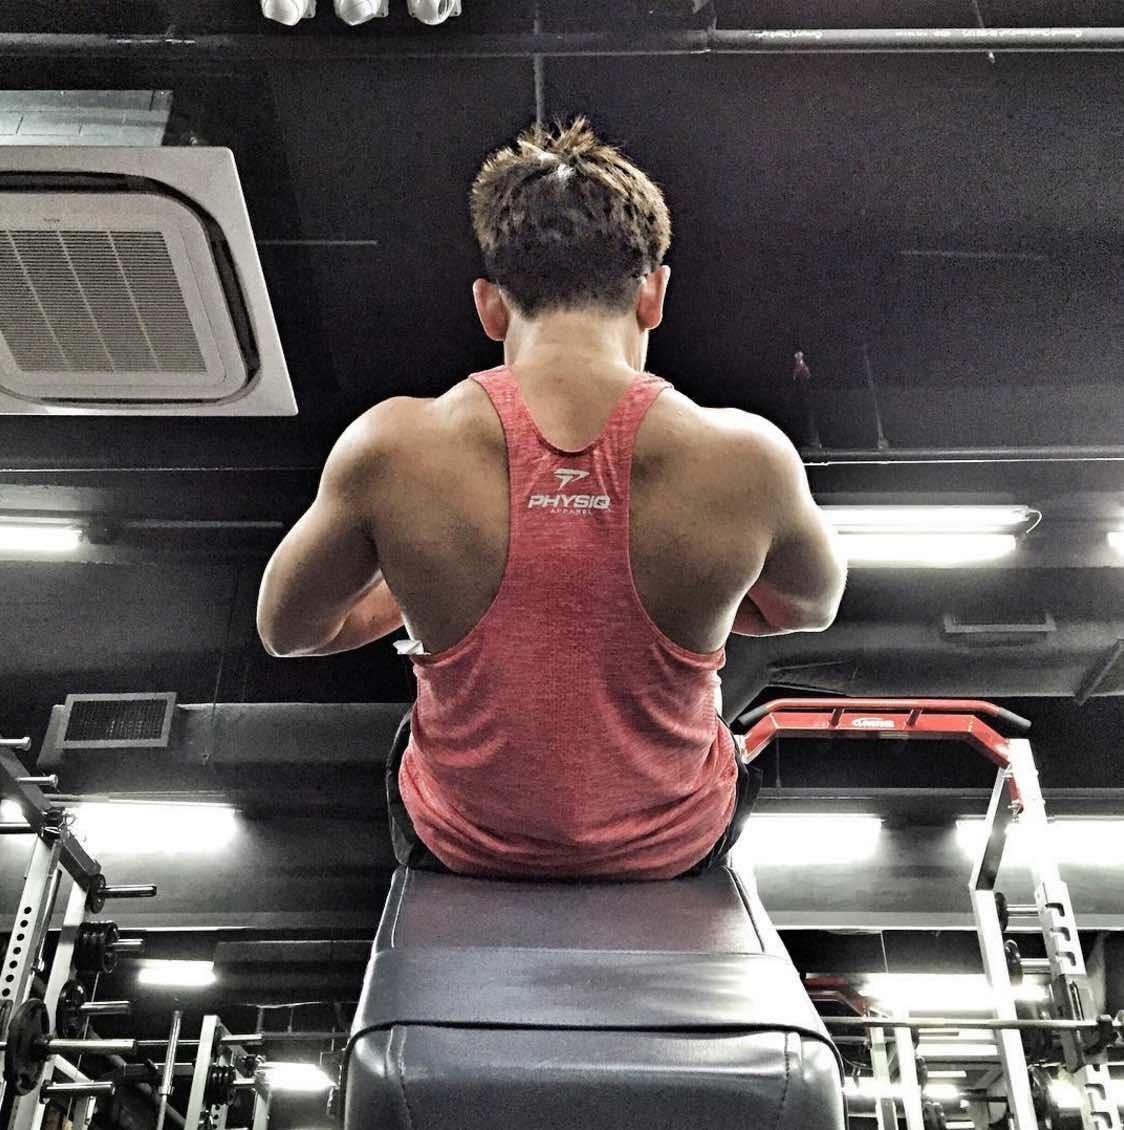 Gym Singapore - AspirantSG